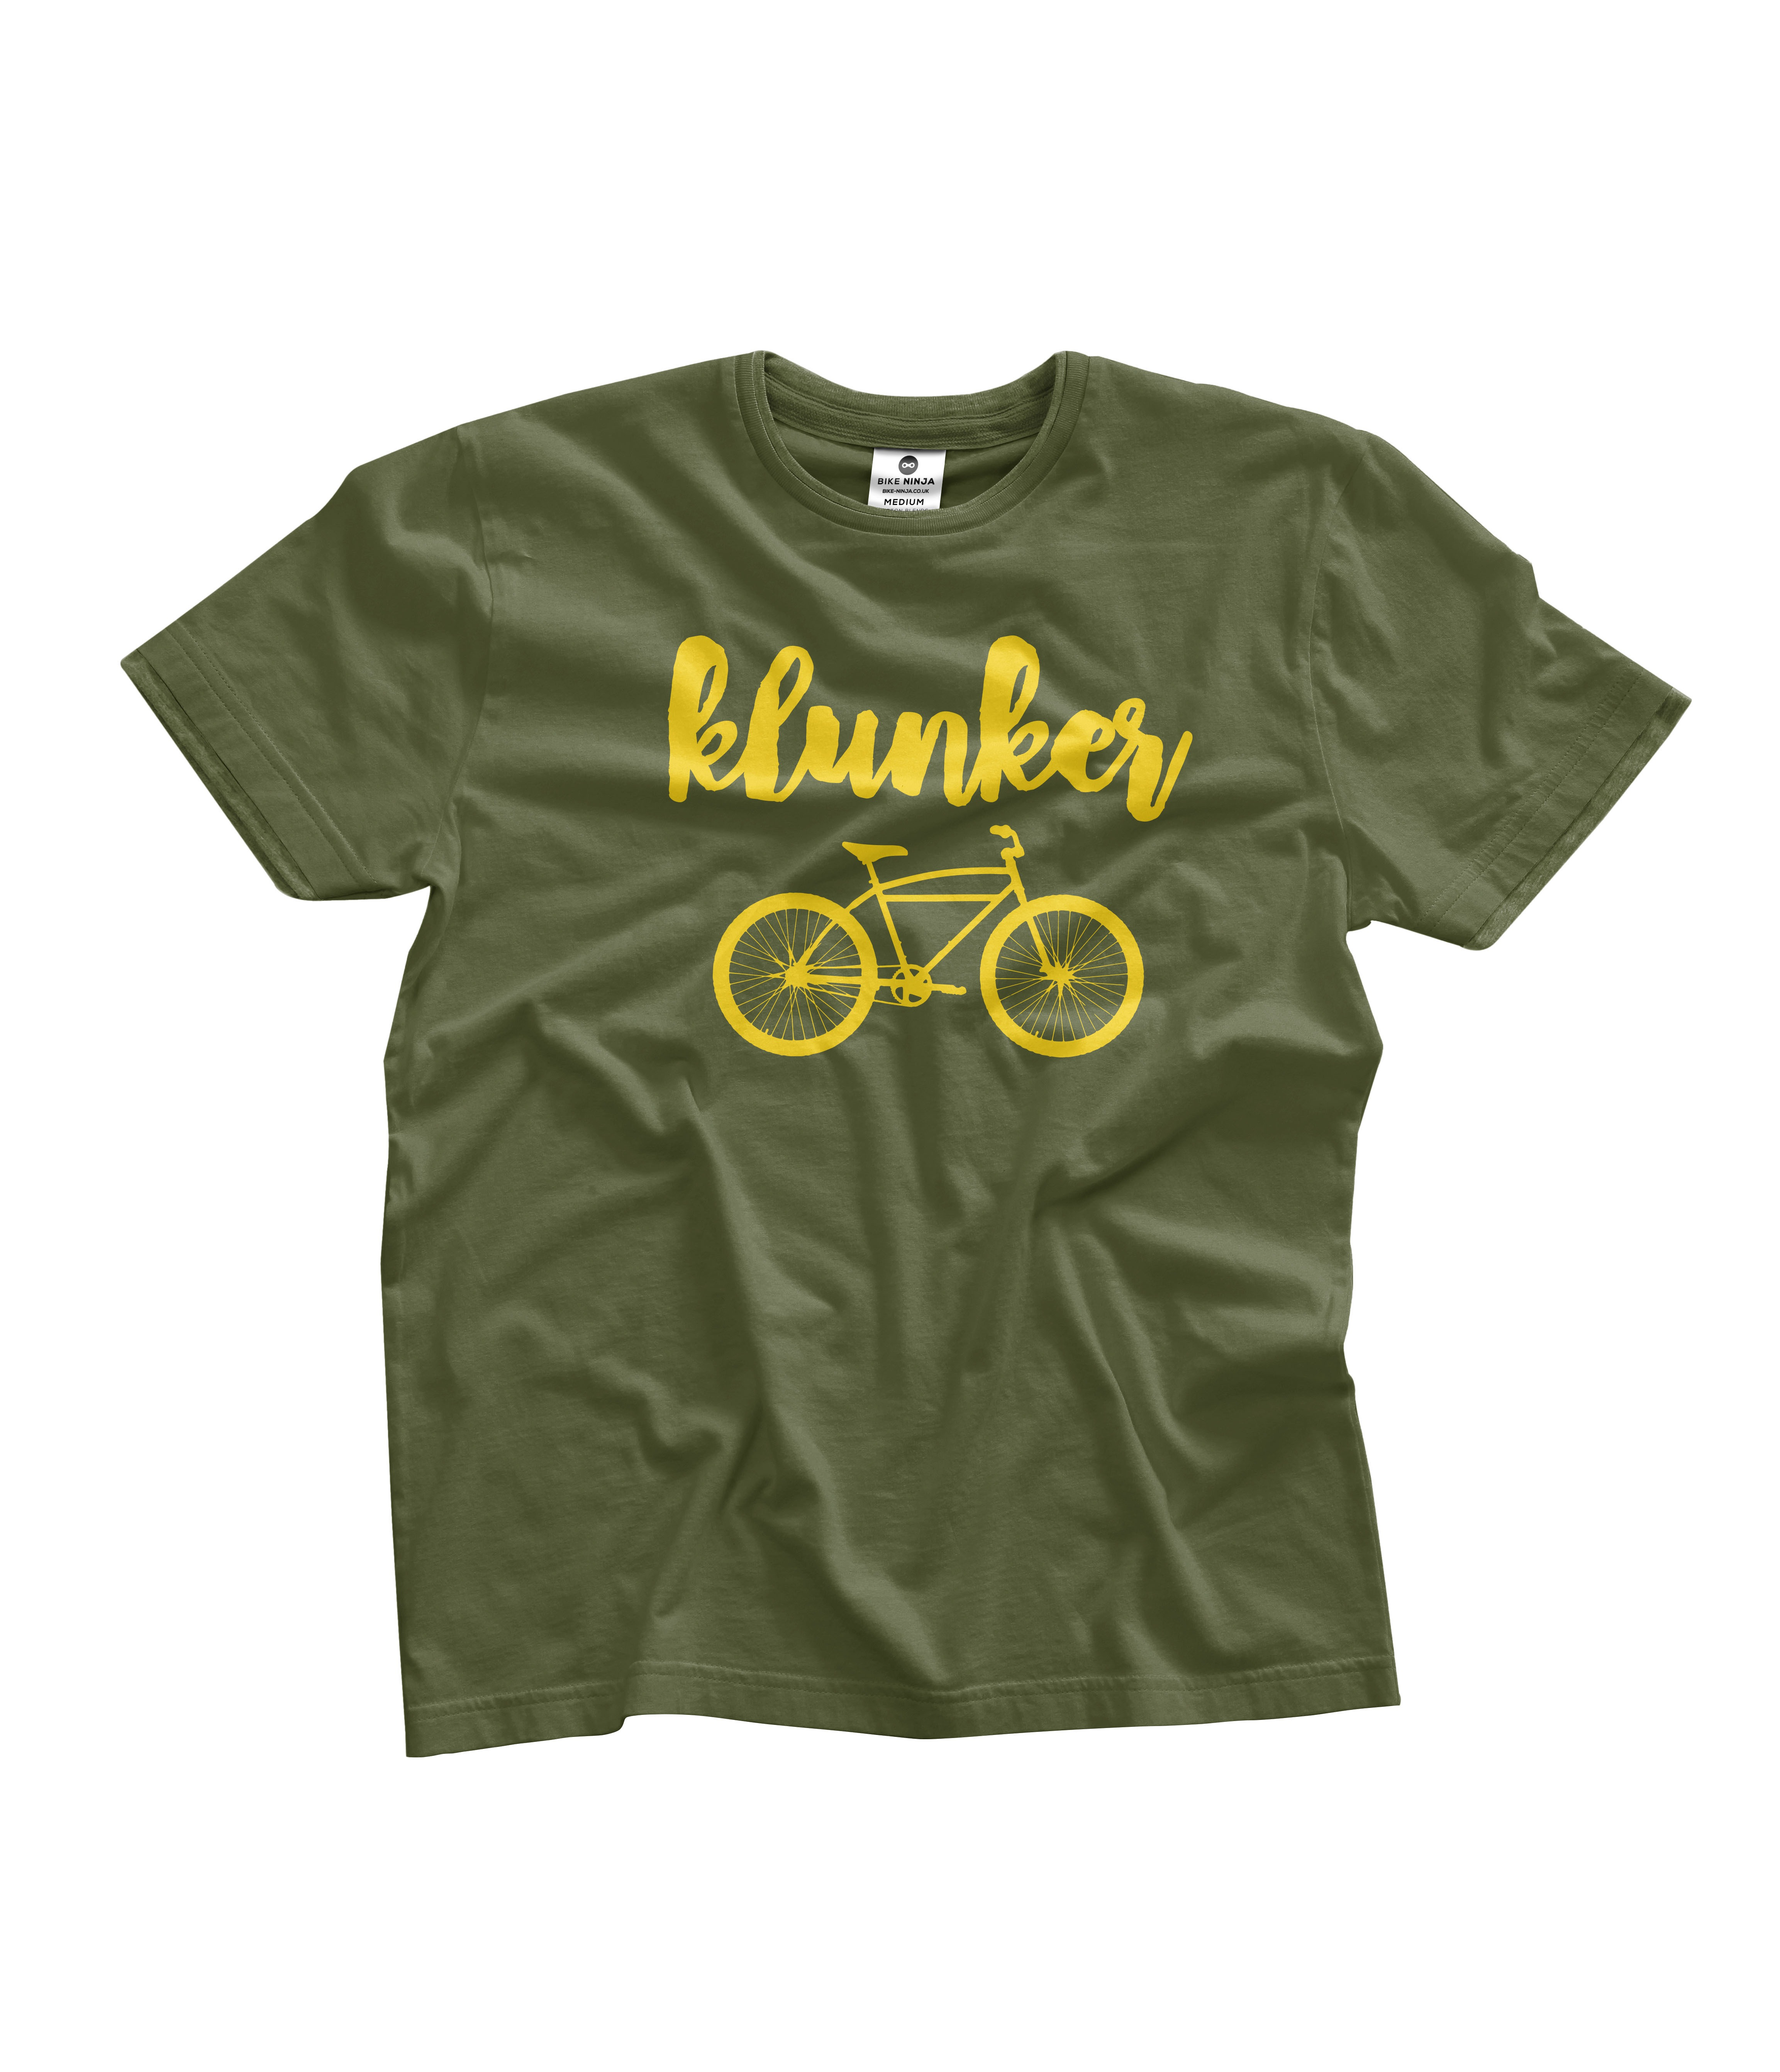 Greetings Card Cycling Bike Ninja Klunker